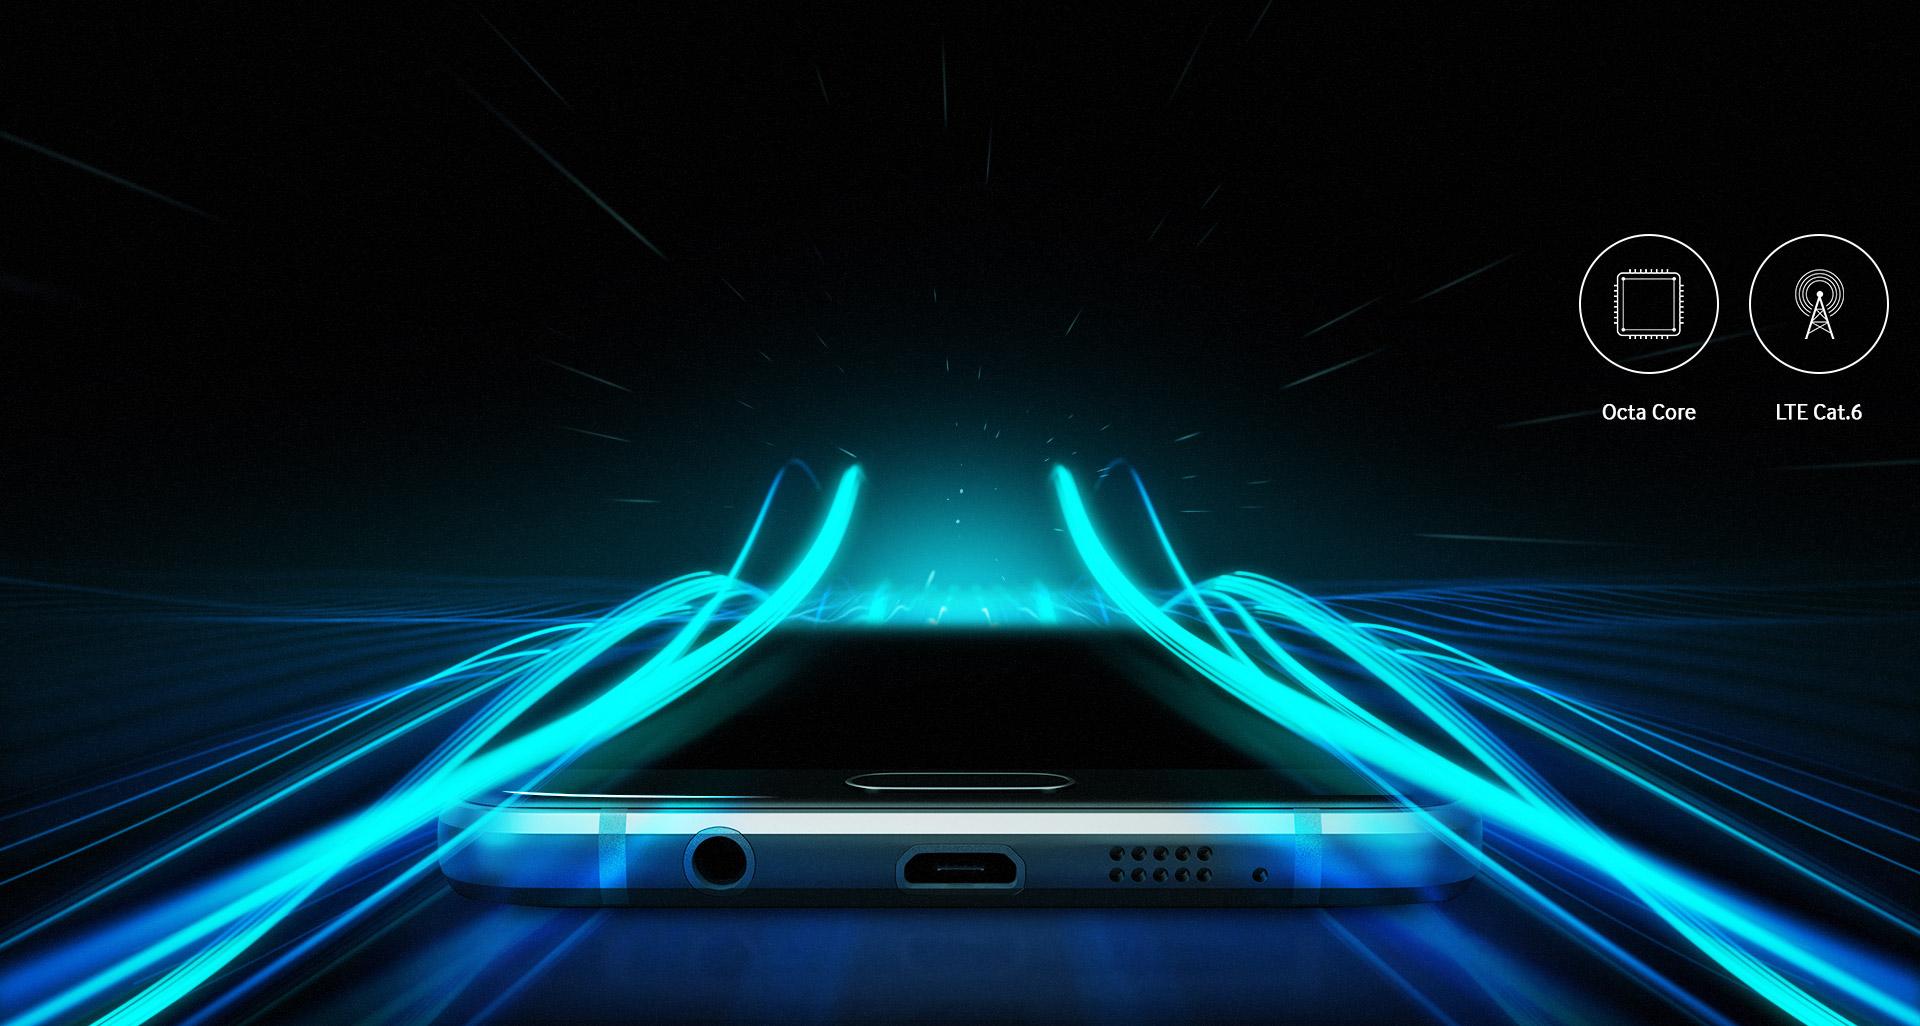 Samsung Galaxy A5 version 2016